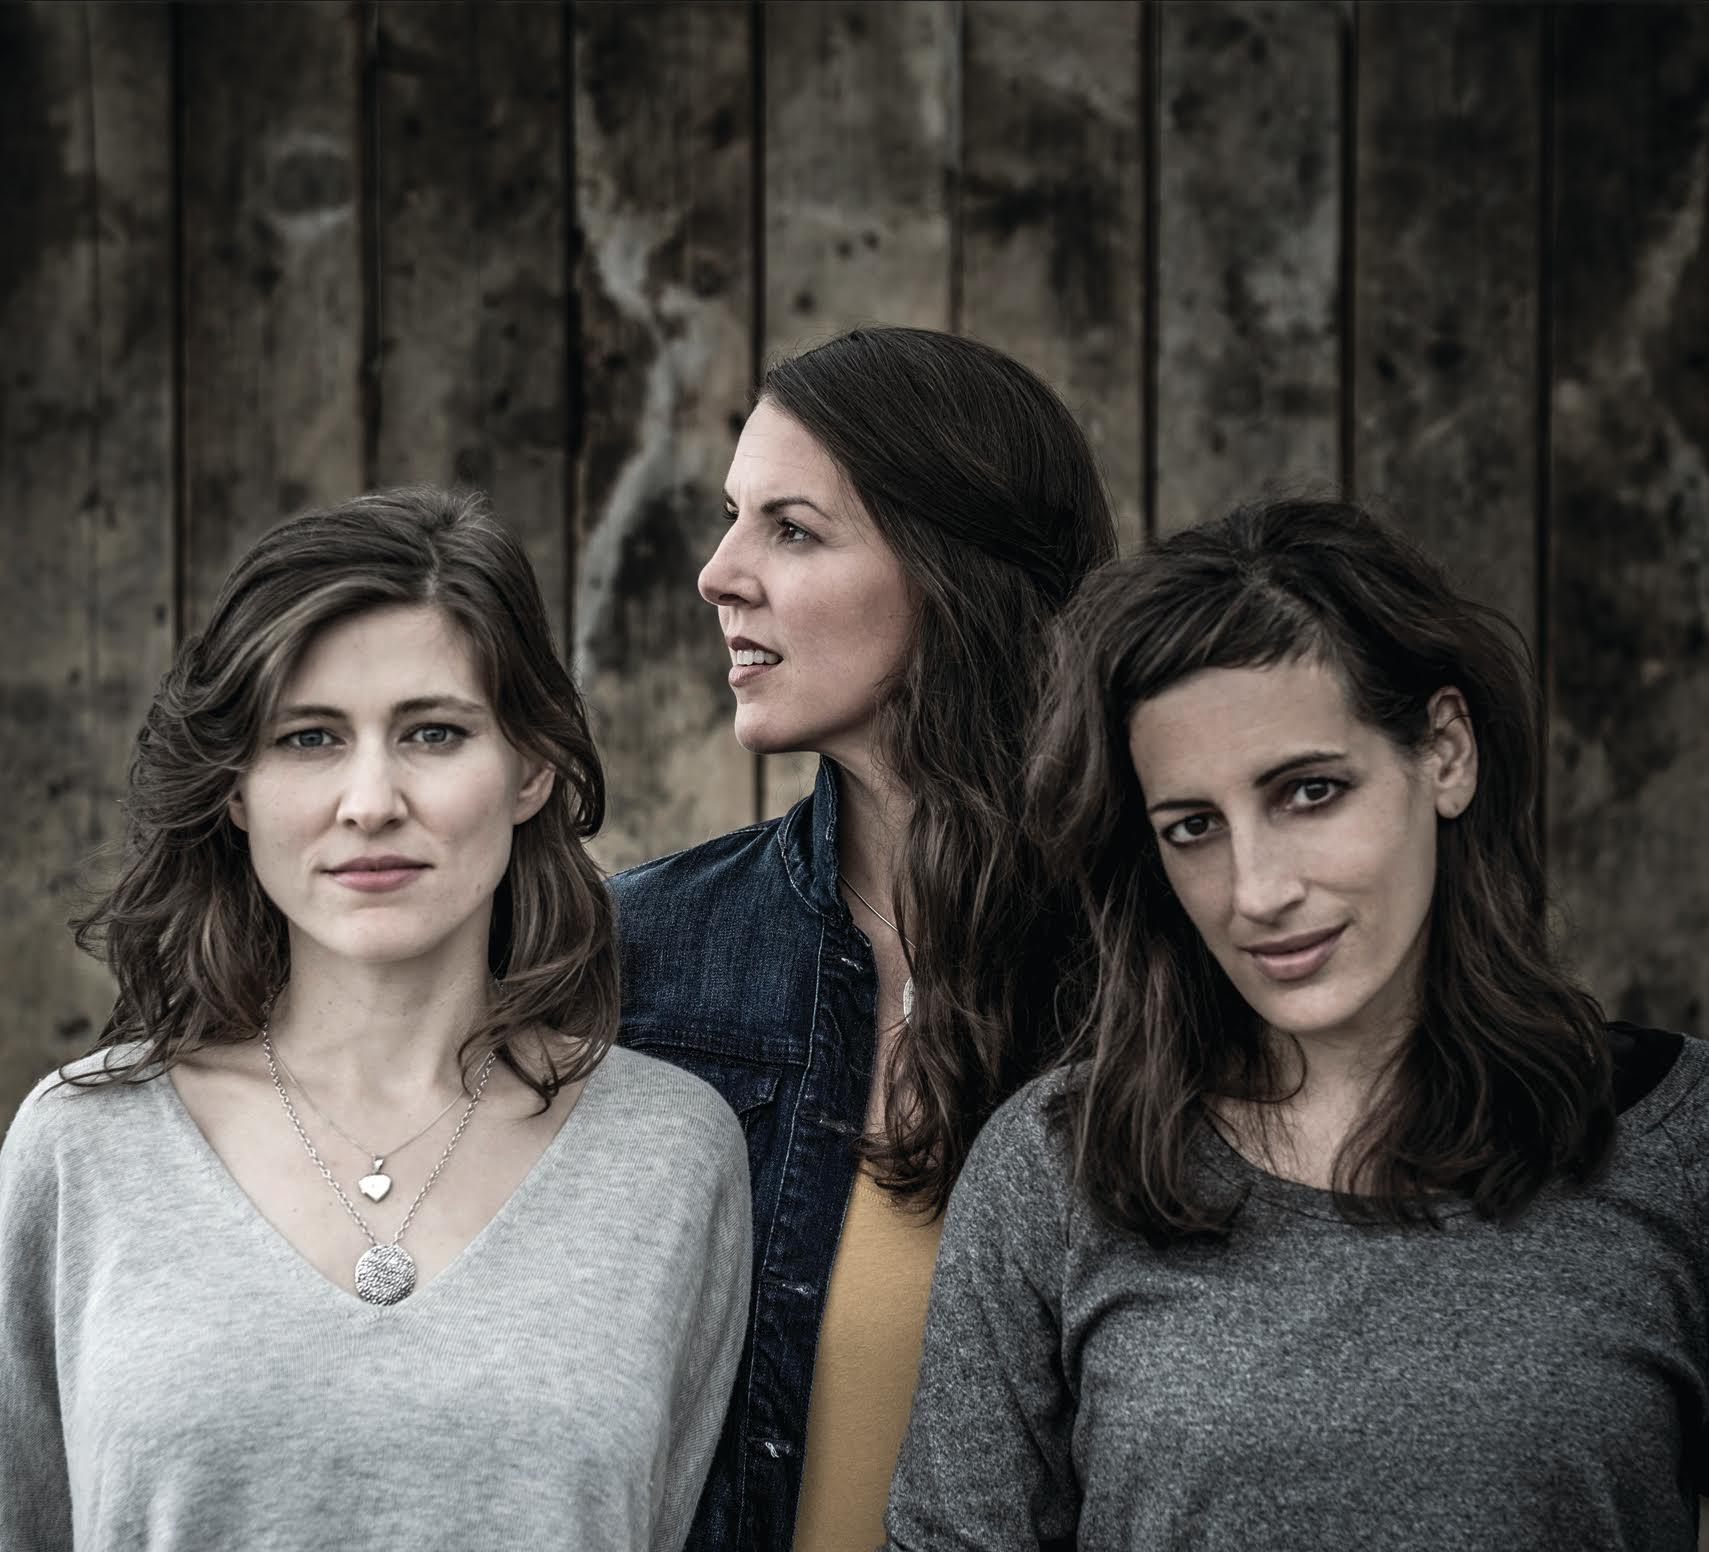 LISTEN: The Wailin' Jennys, 'Boulder to Birmingham'